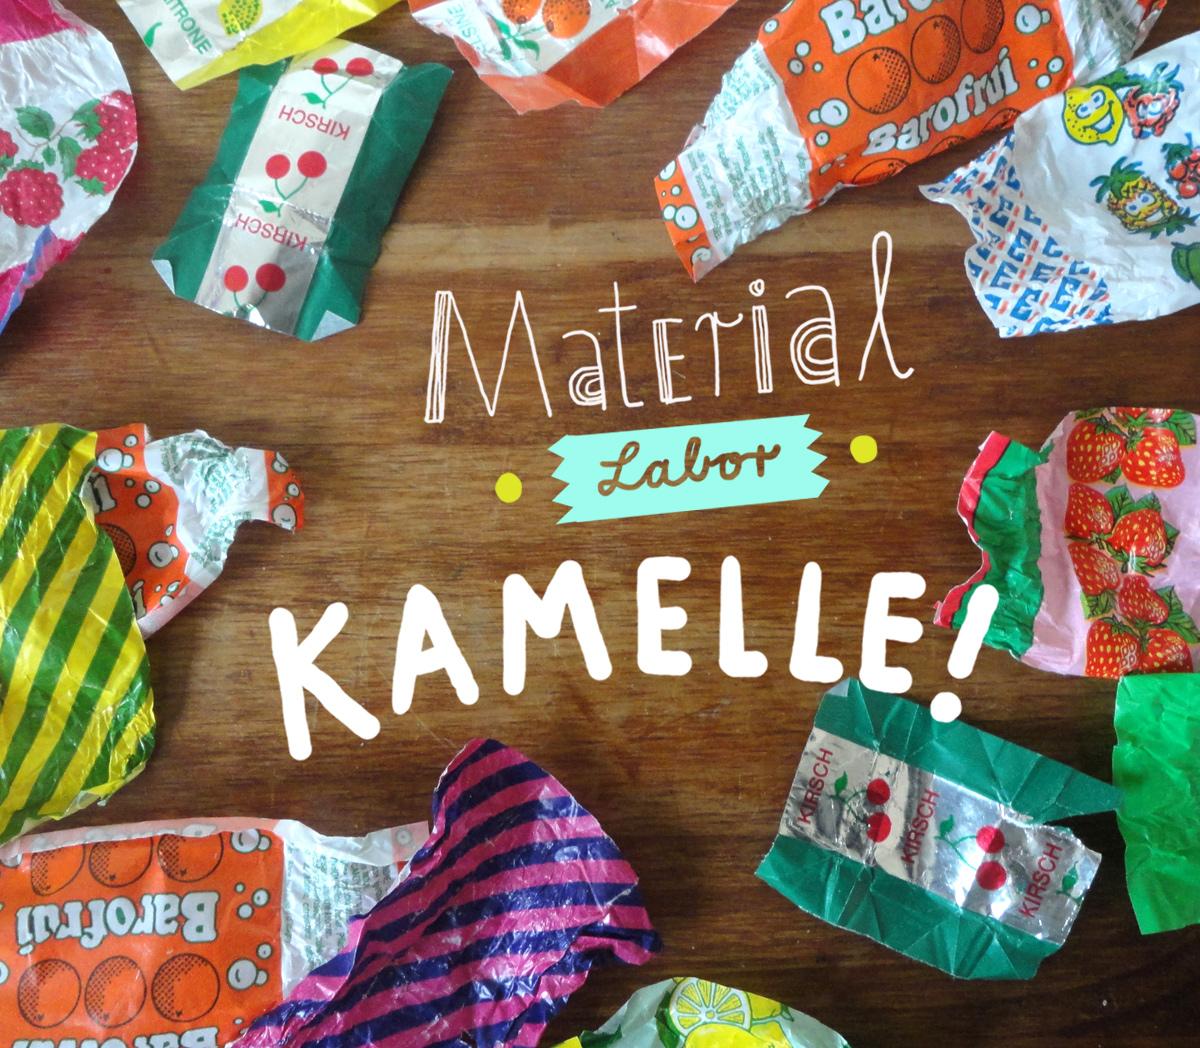 Titelbild Materiallabor: Kamelle / Bonbonpapier